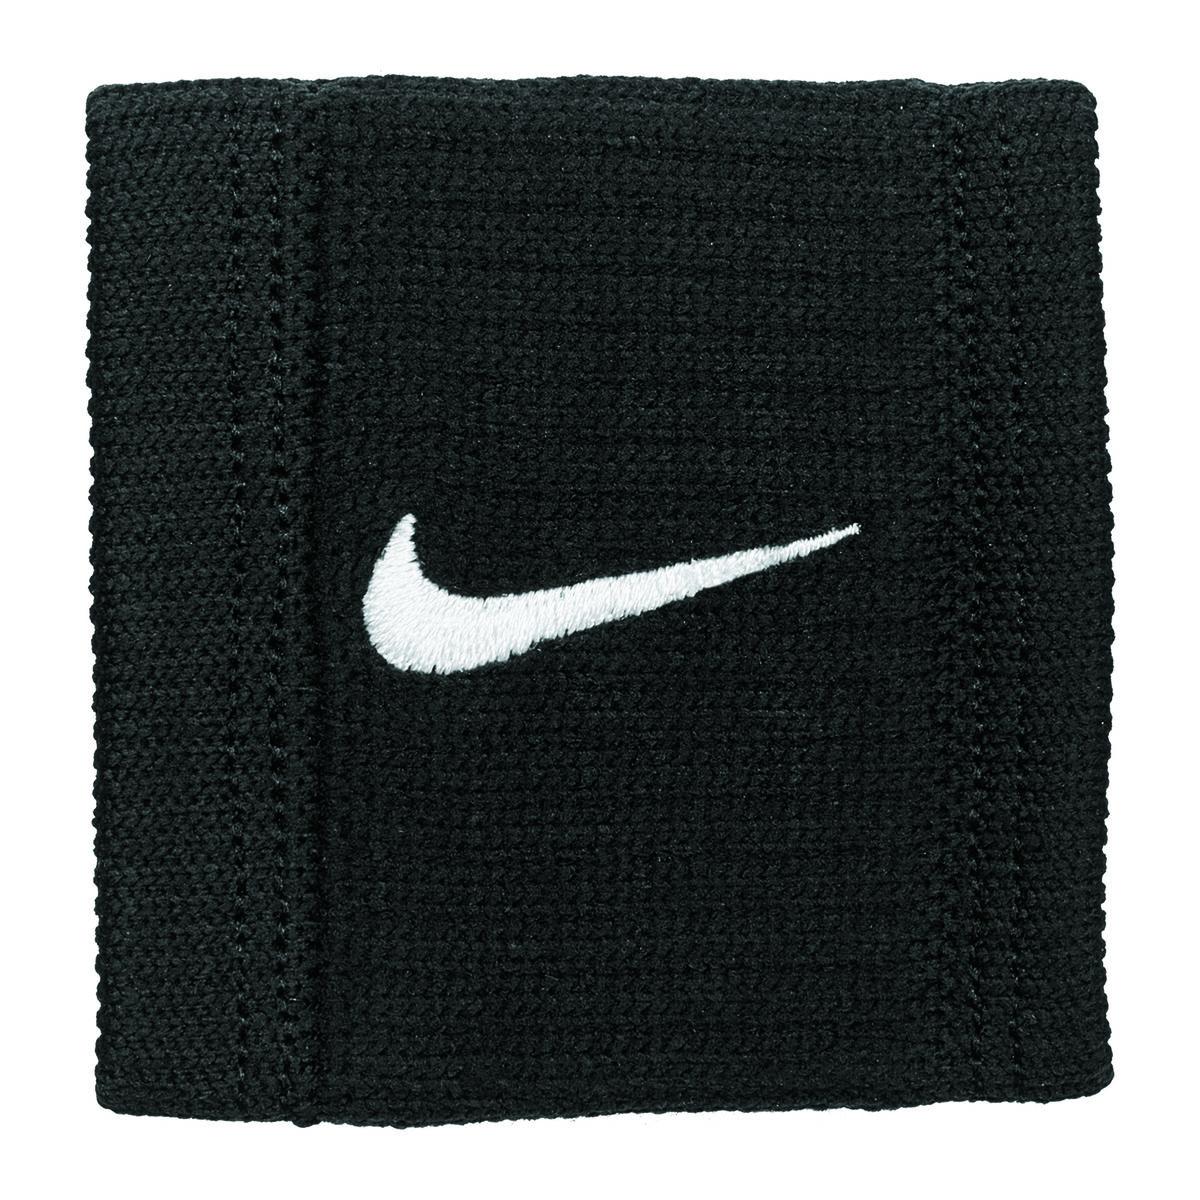 dda18848eec55 Nike Dri-Fit Reveal Wristband   PGA TOUR Superstore